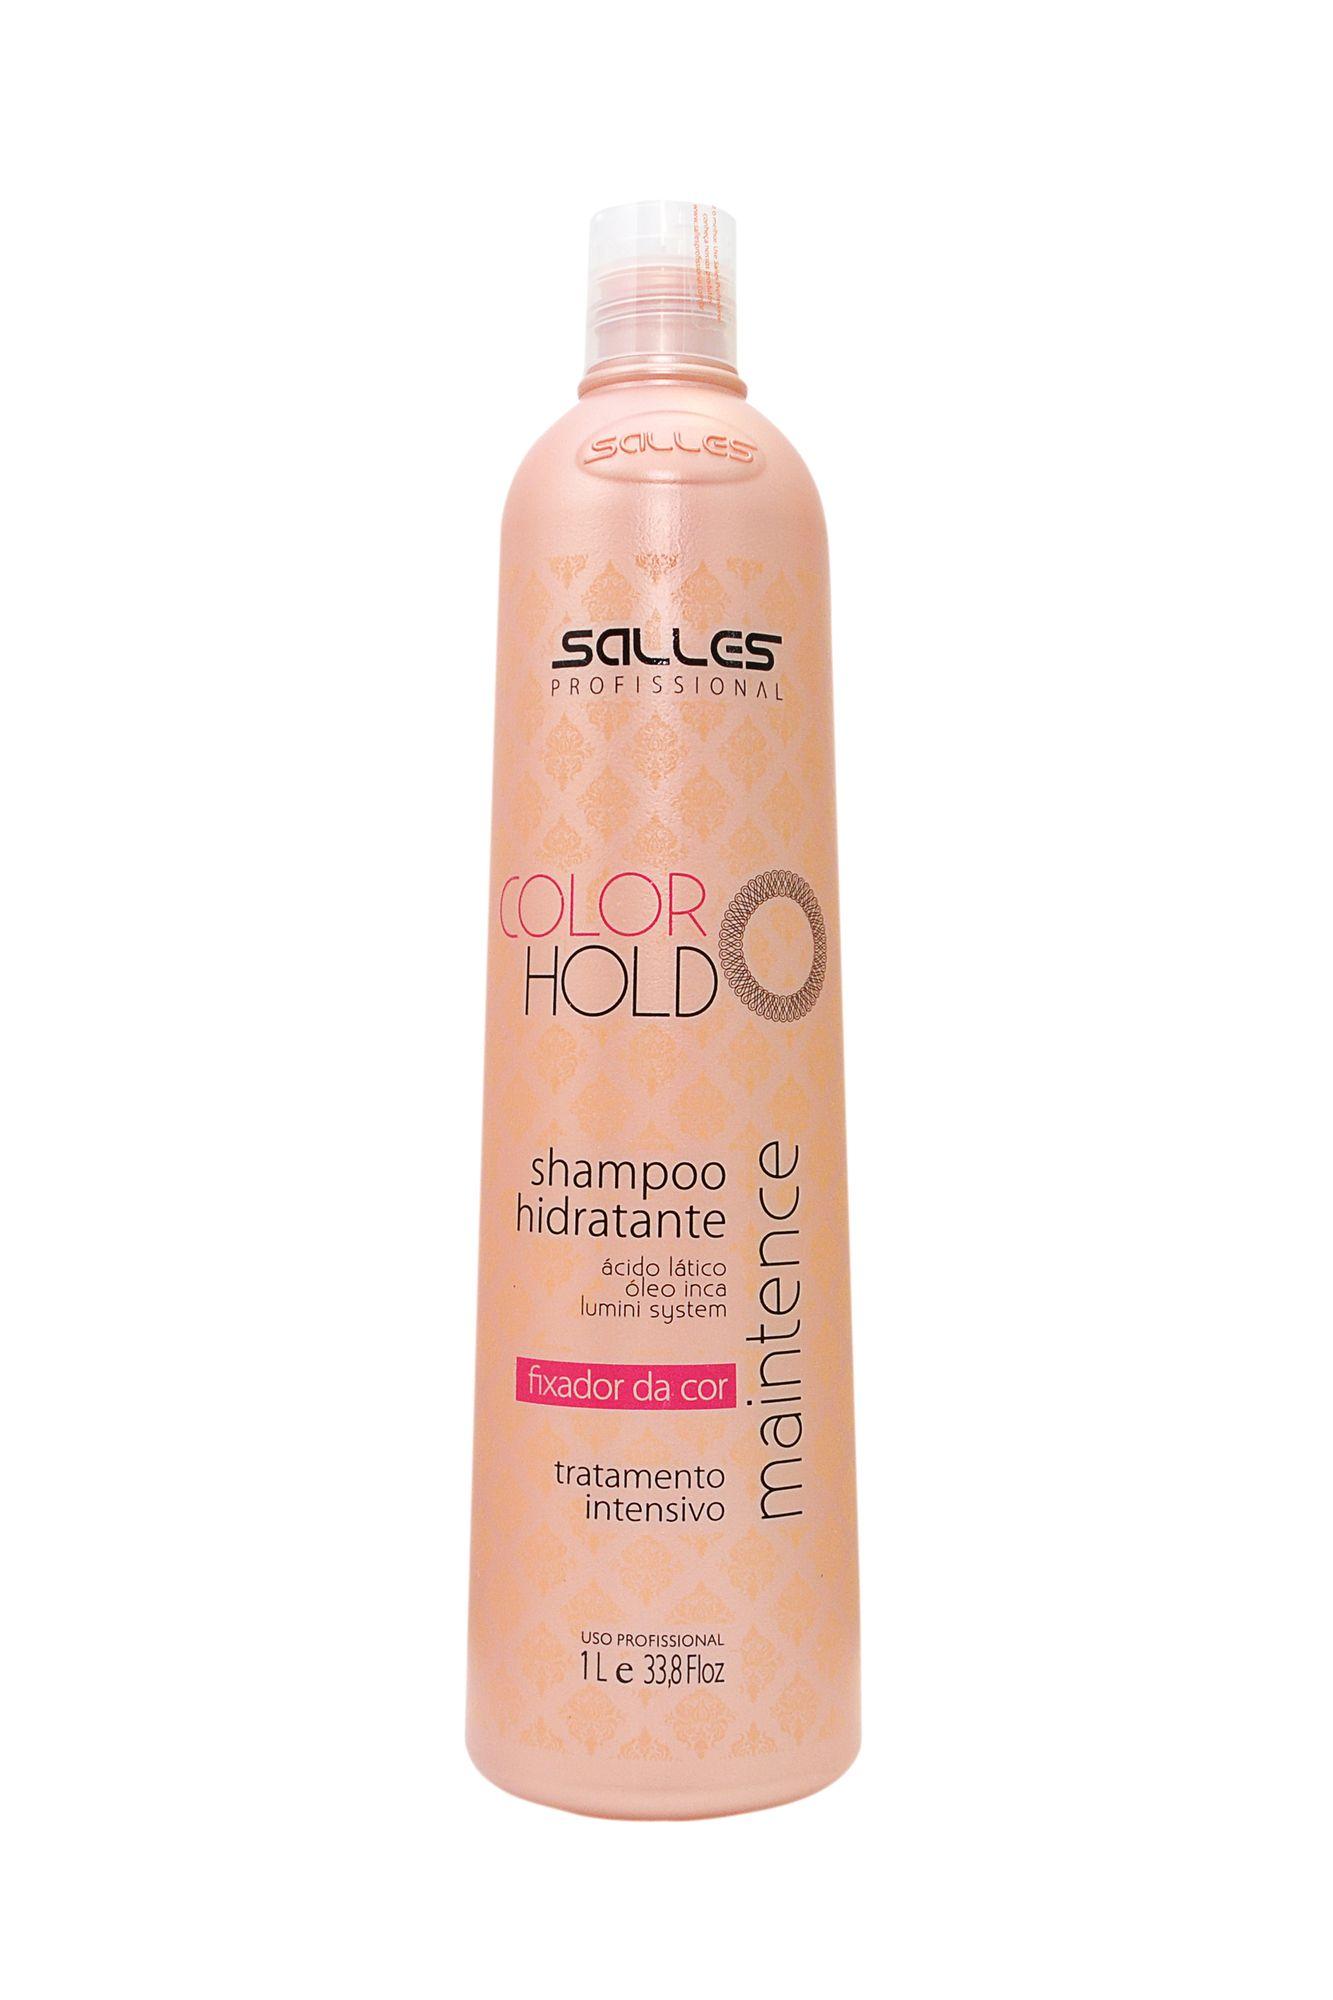 Shampoo Color Hold Salles Profissional 1lt